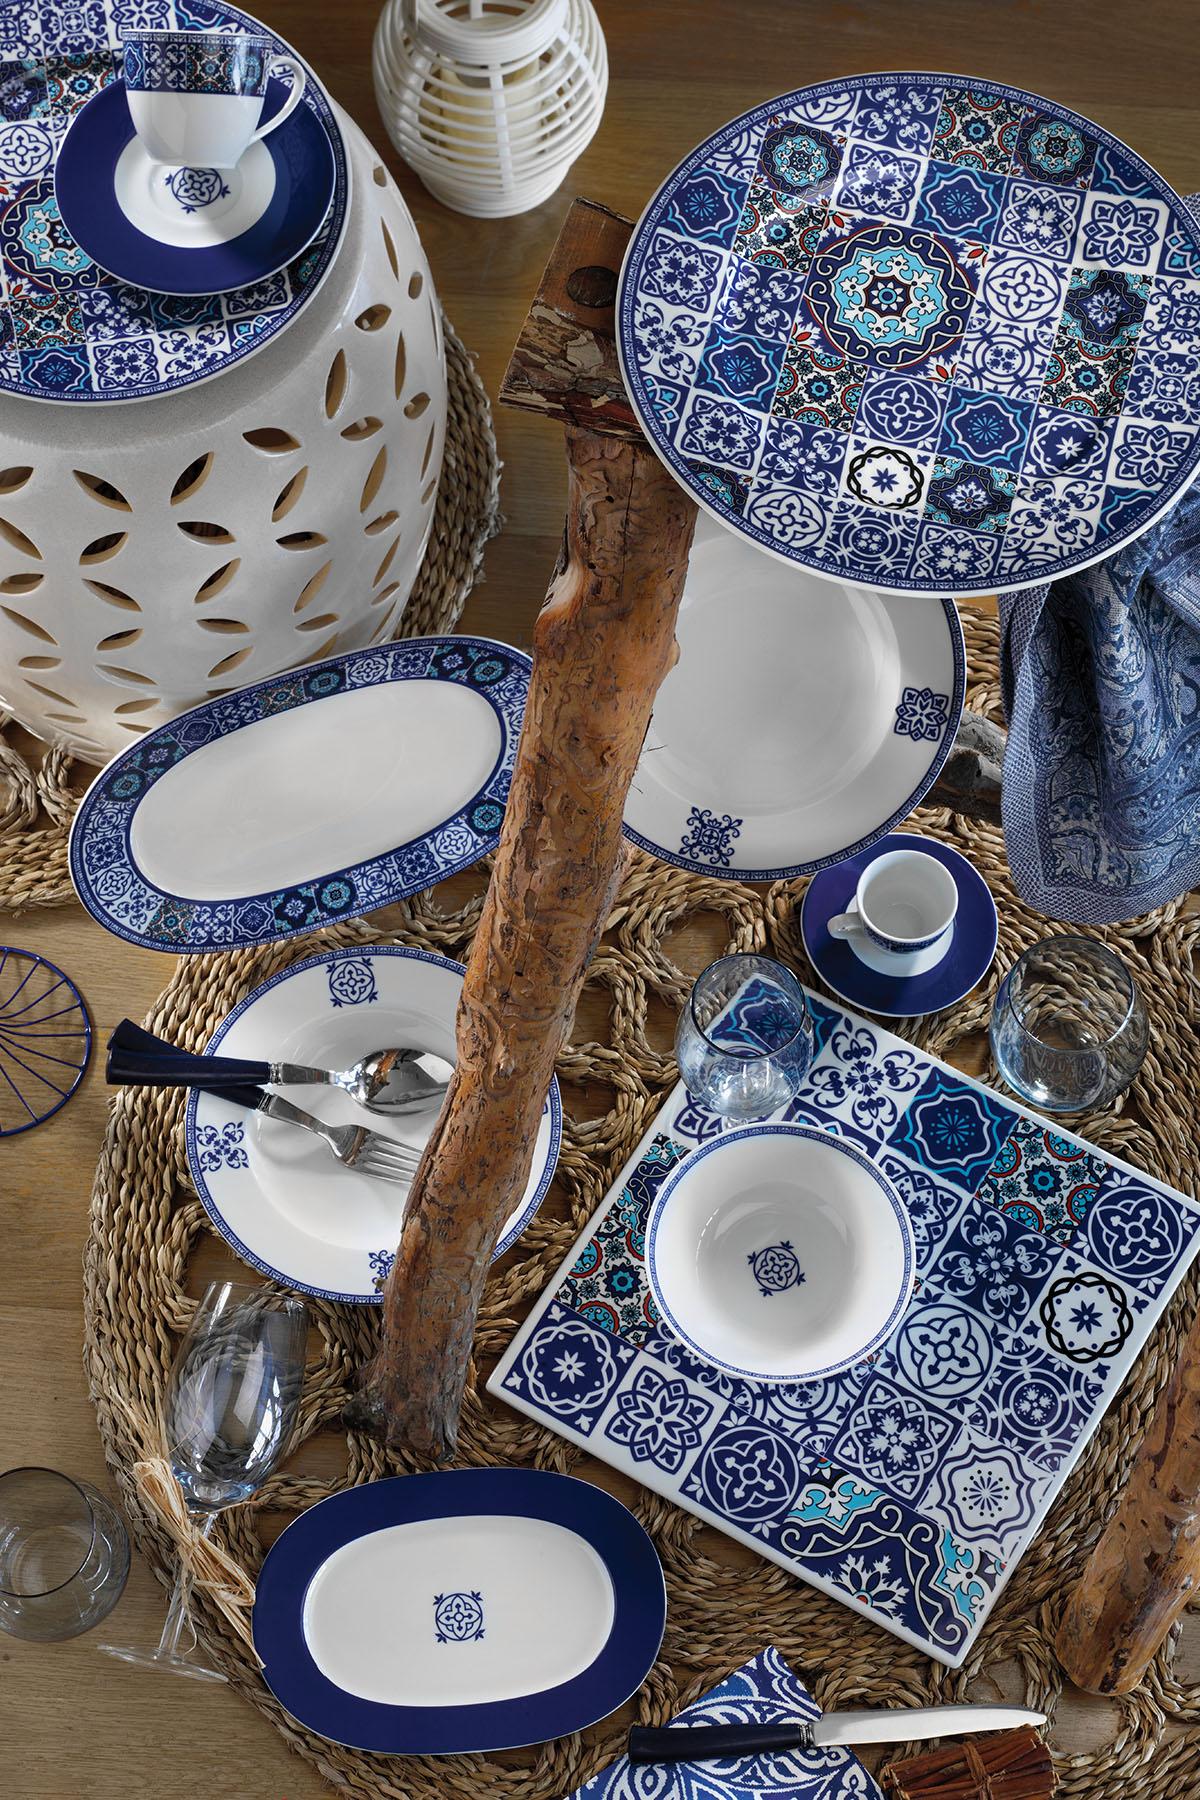 Kütahya Porselen - Kütahya Porselen 9429 Desen 24 Parça Yemek Seti